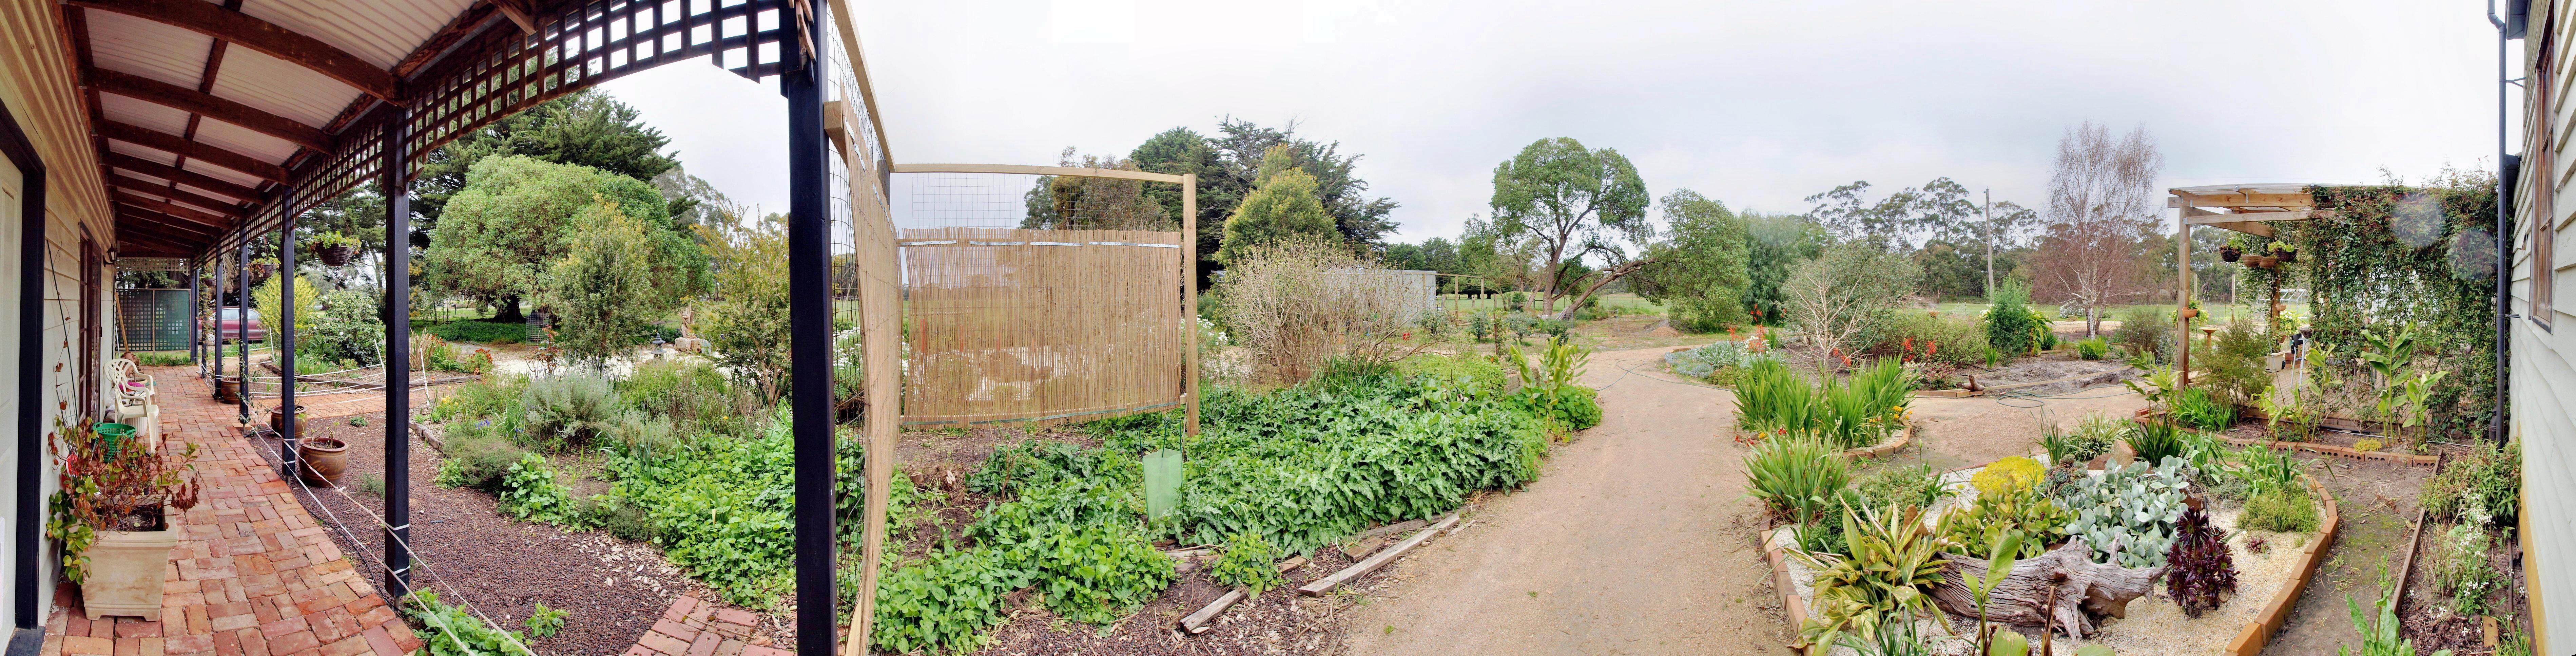 garden-e-panorama.jpeg